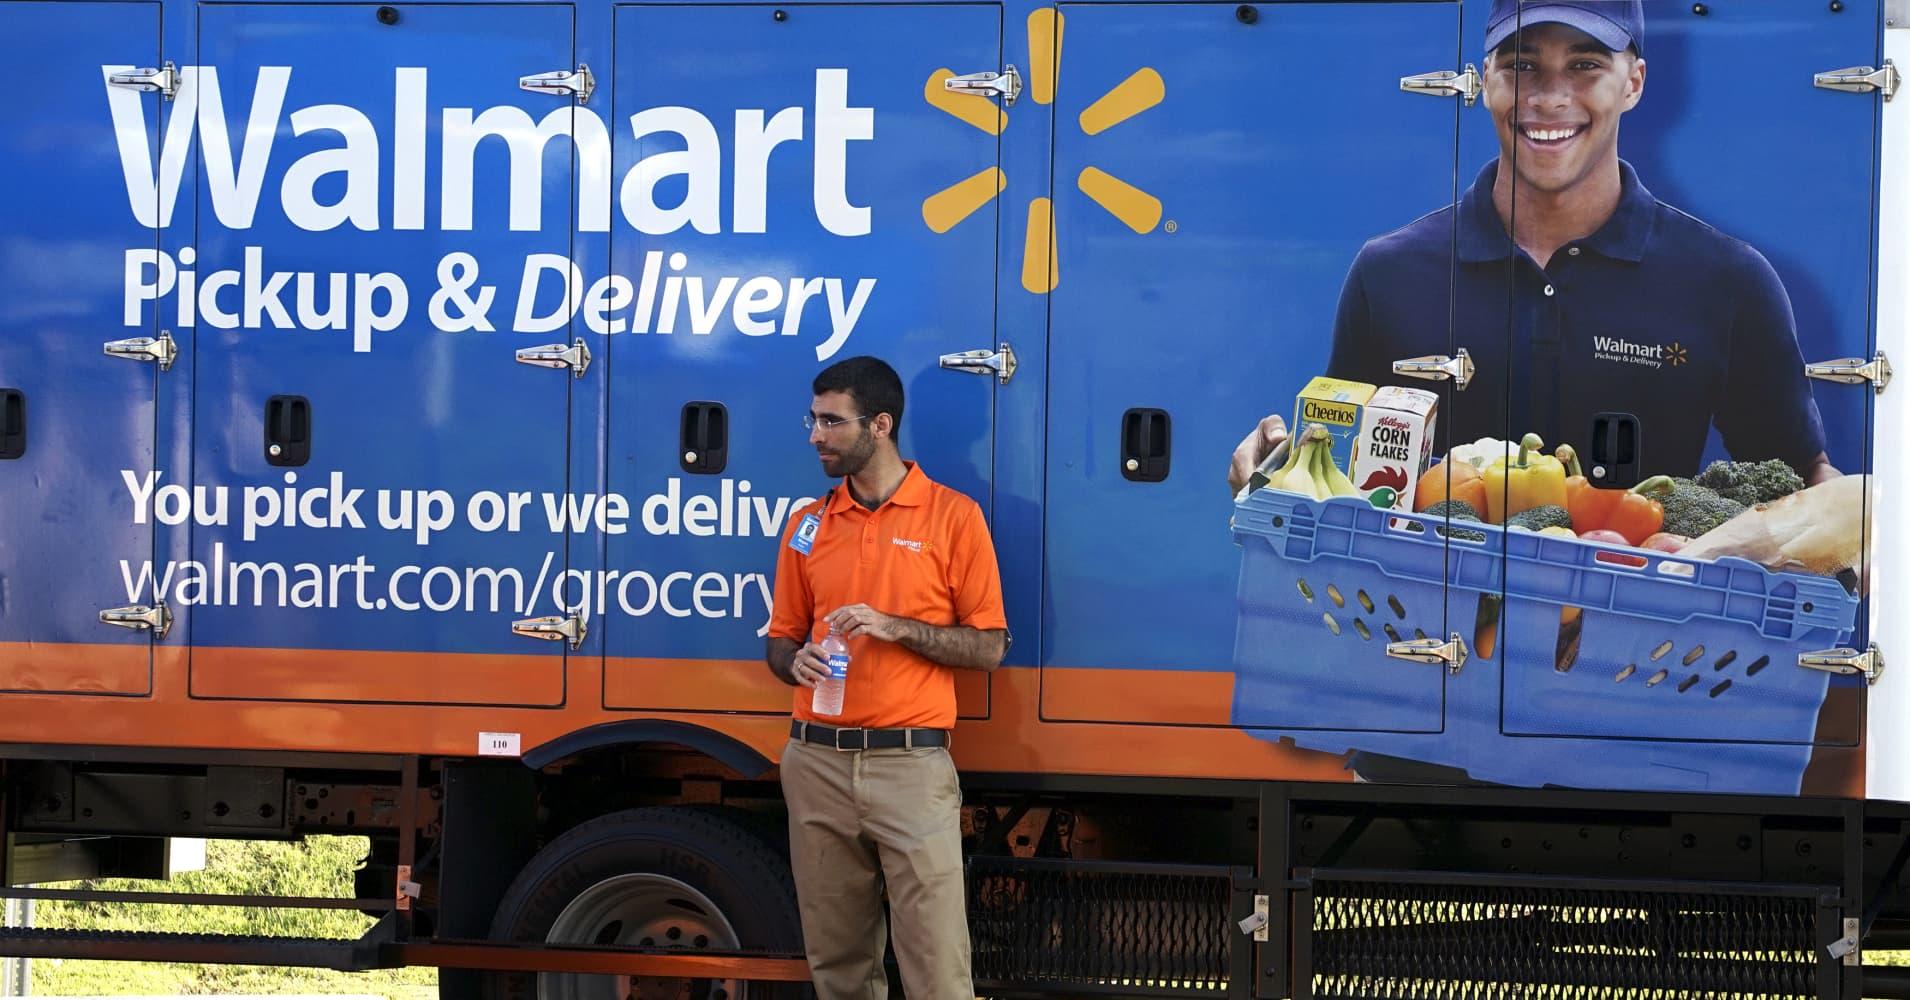 A Walmart Pickup-Grocery employee waits next to a truck.